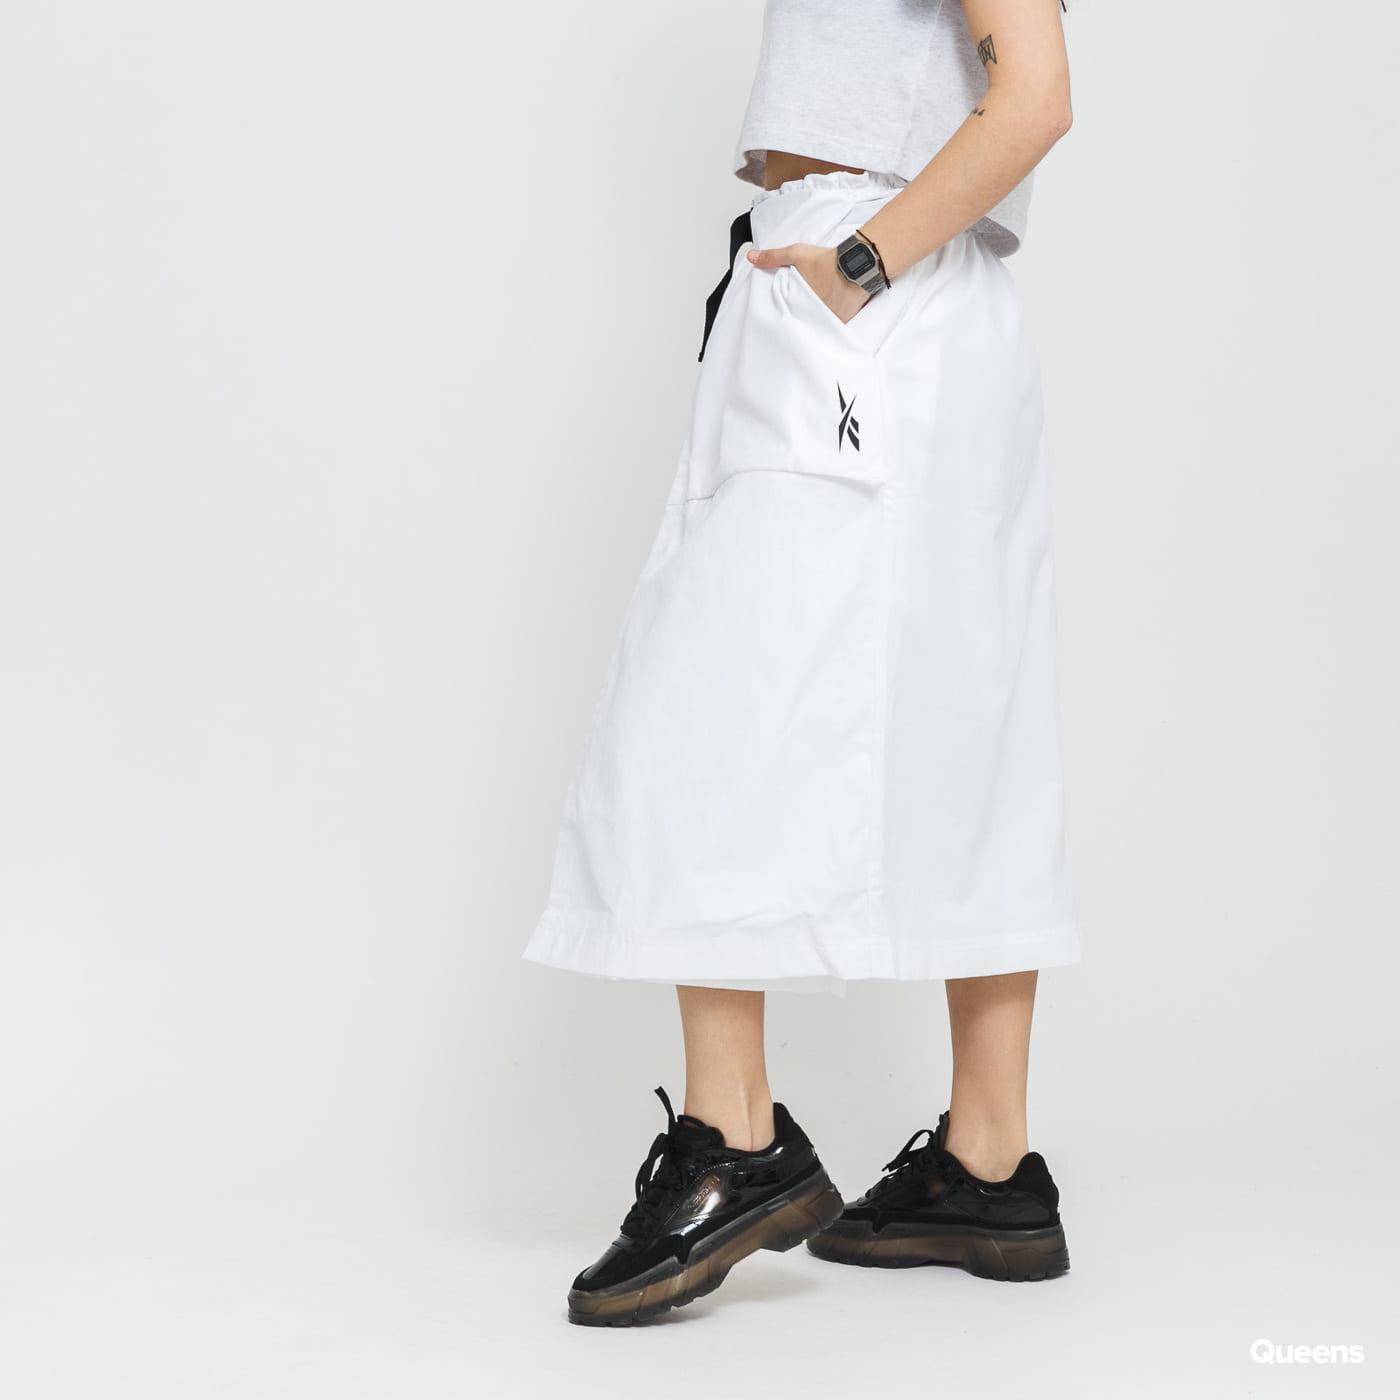 Reebok TS Fashion Layering Skirt blue / turquoise